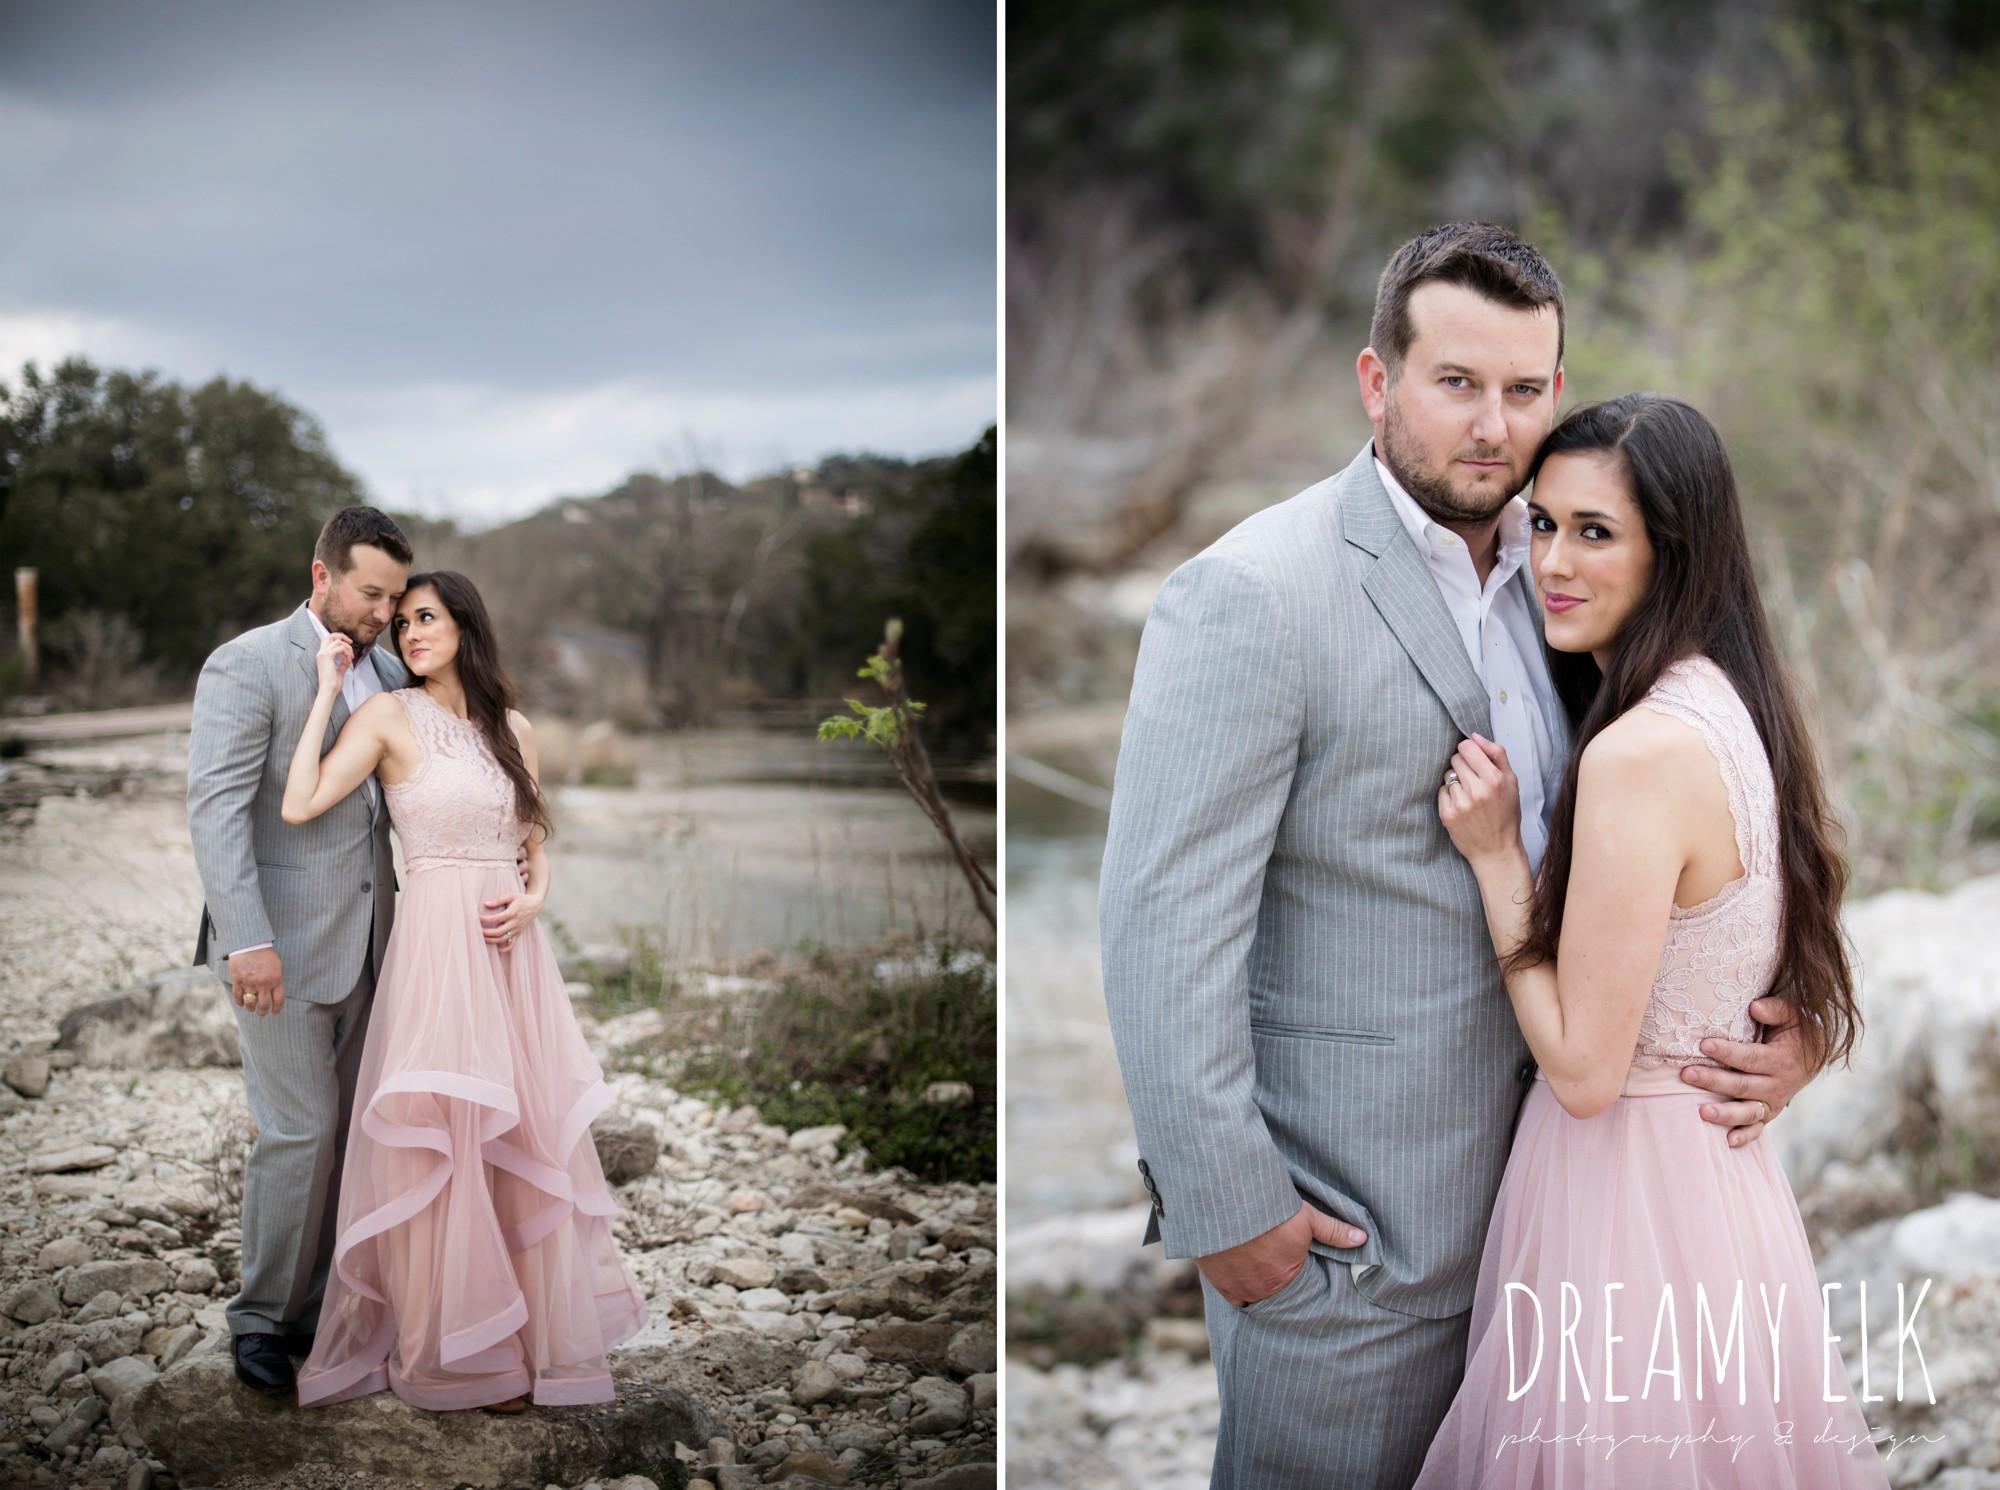 long pink dress, gray suit, dressy winter romantic anniversary photo shoot, bull creek park, austin, texas {dreamy elk photography and design}